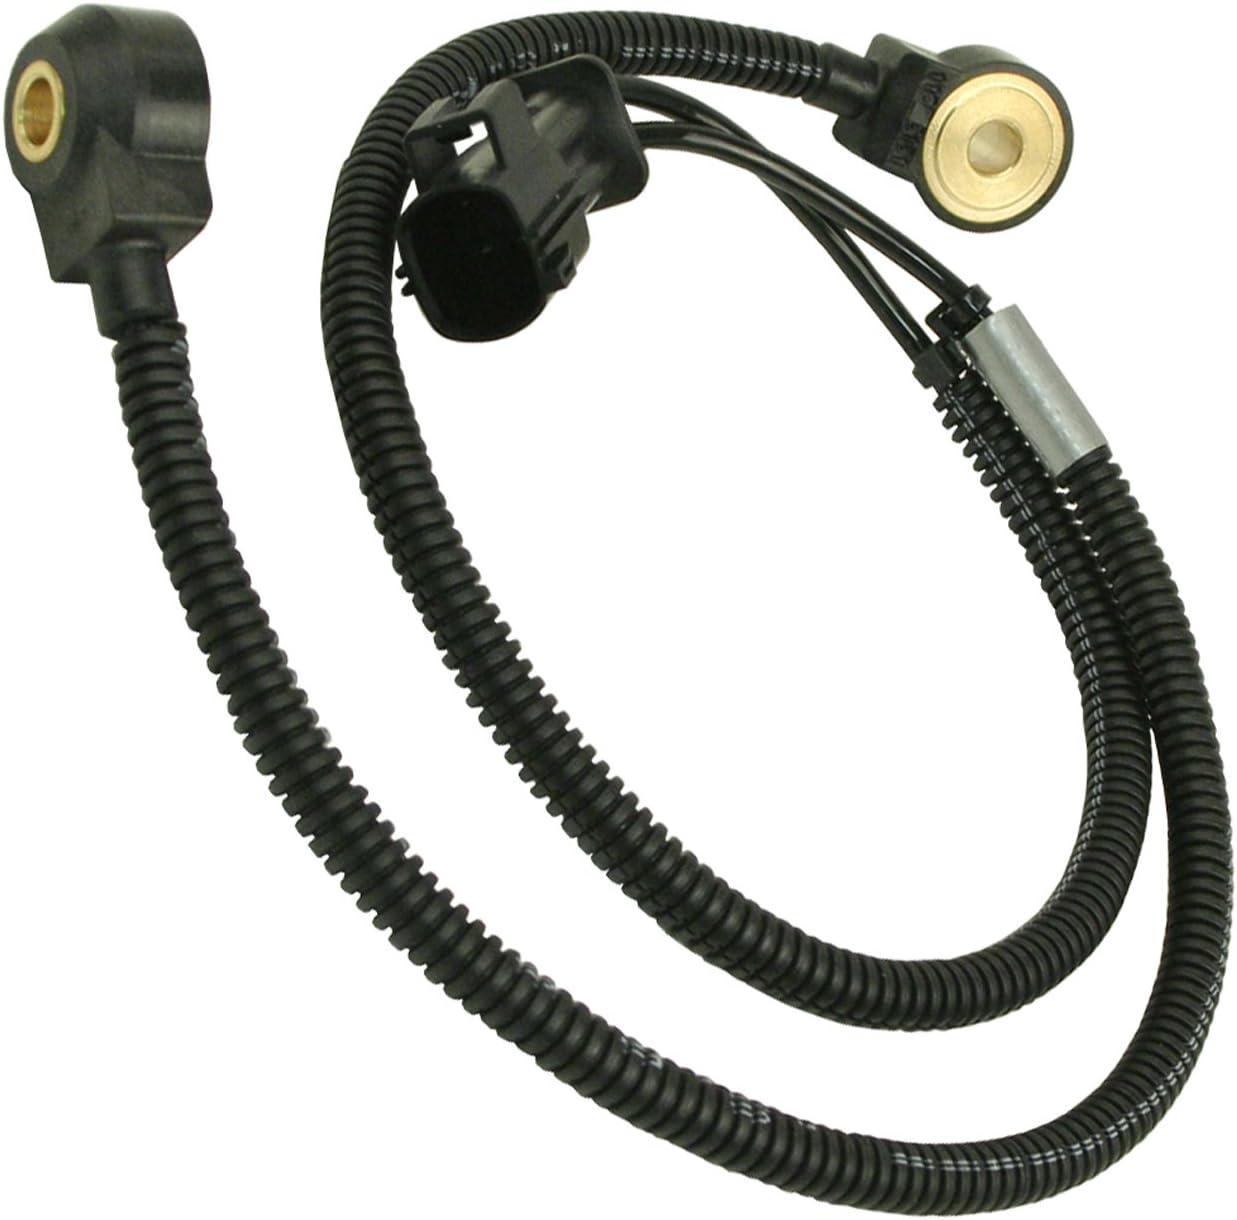 Beck Arnley 158-1003 Knock Sensor